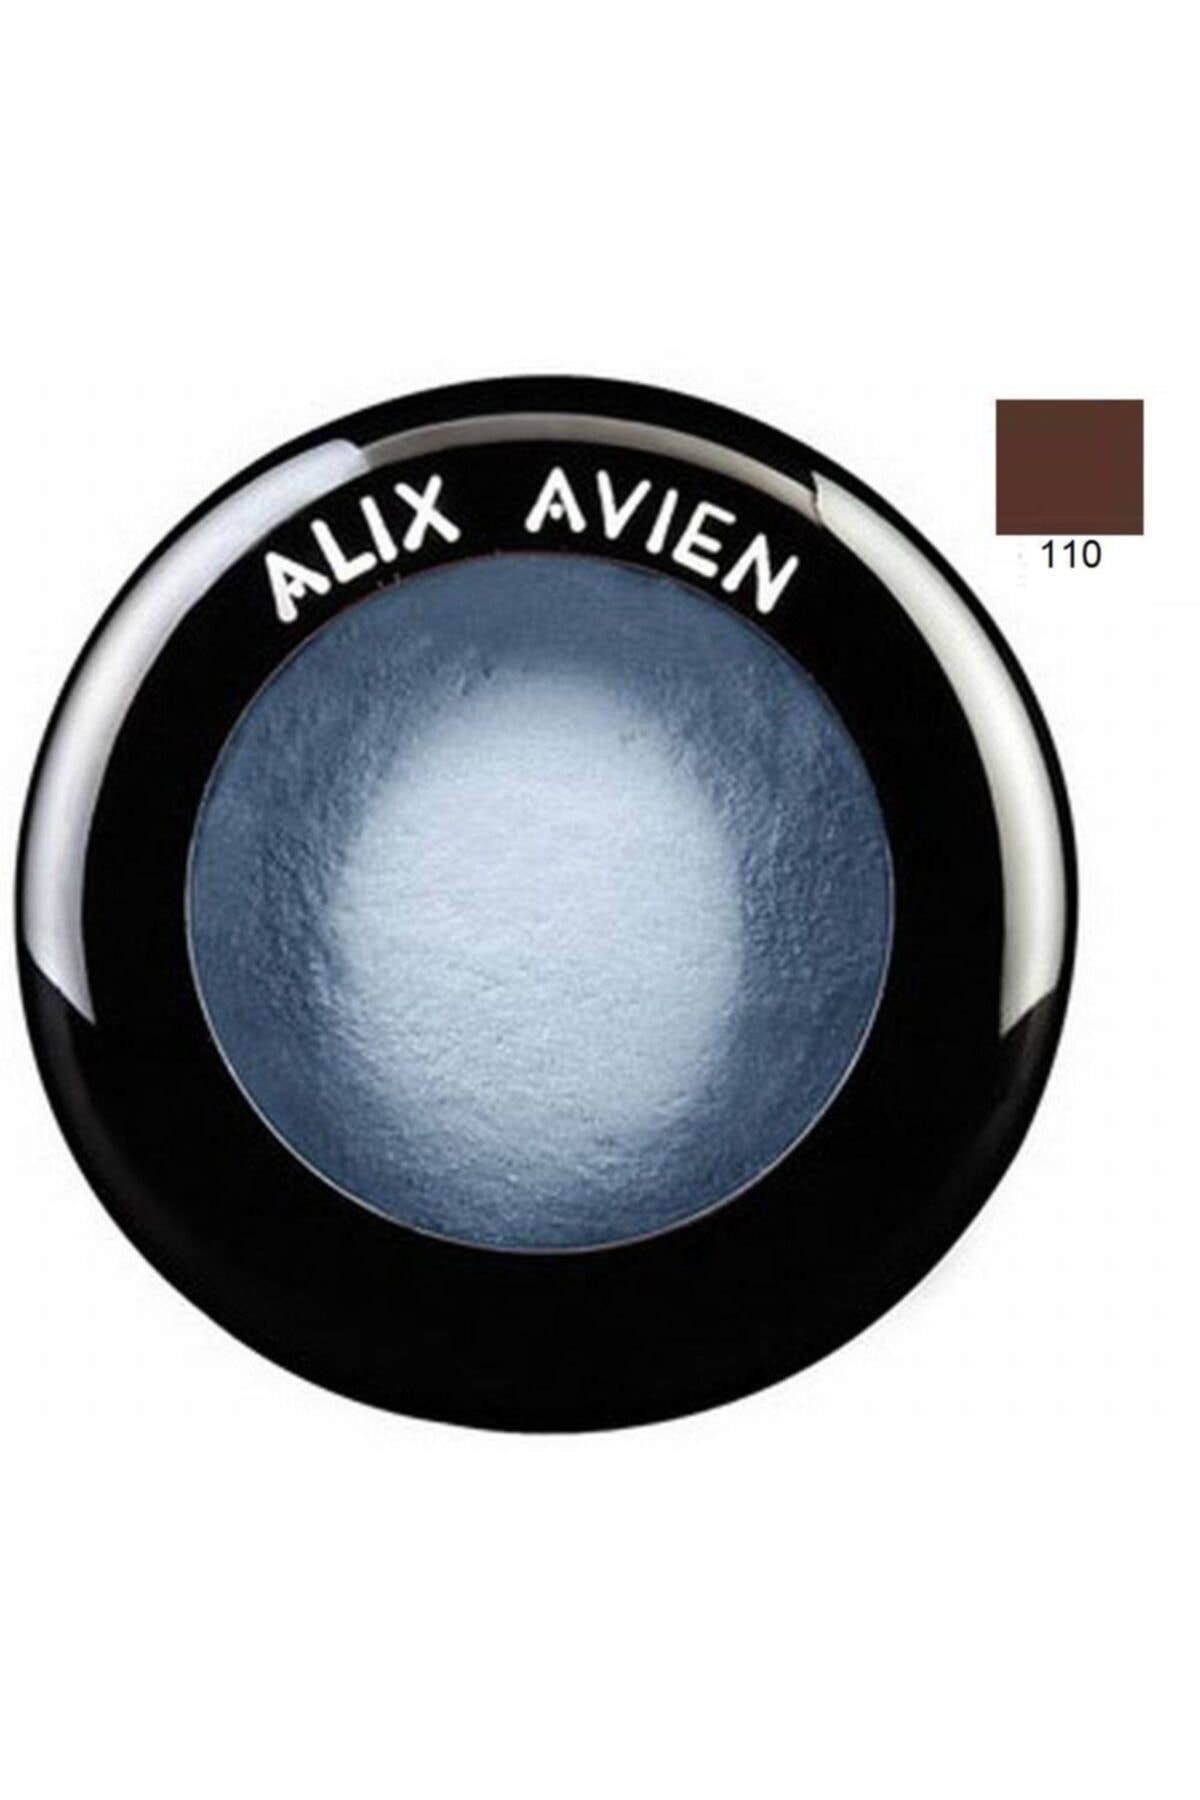 Alix Avien Terracotta Tekli Far No 110 1